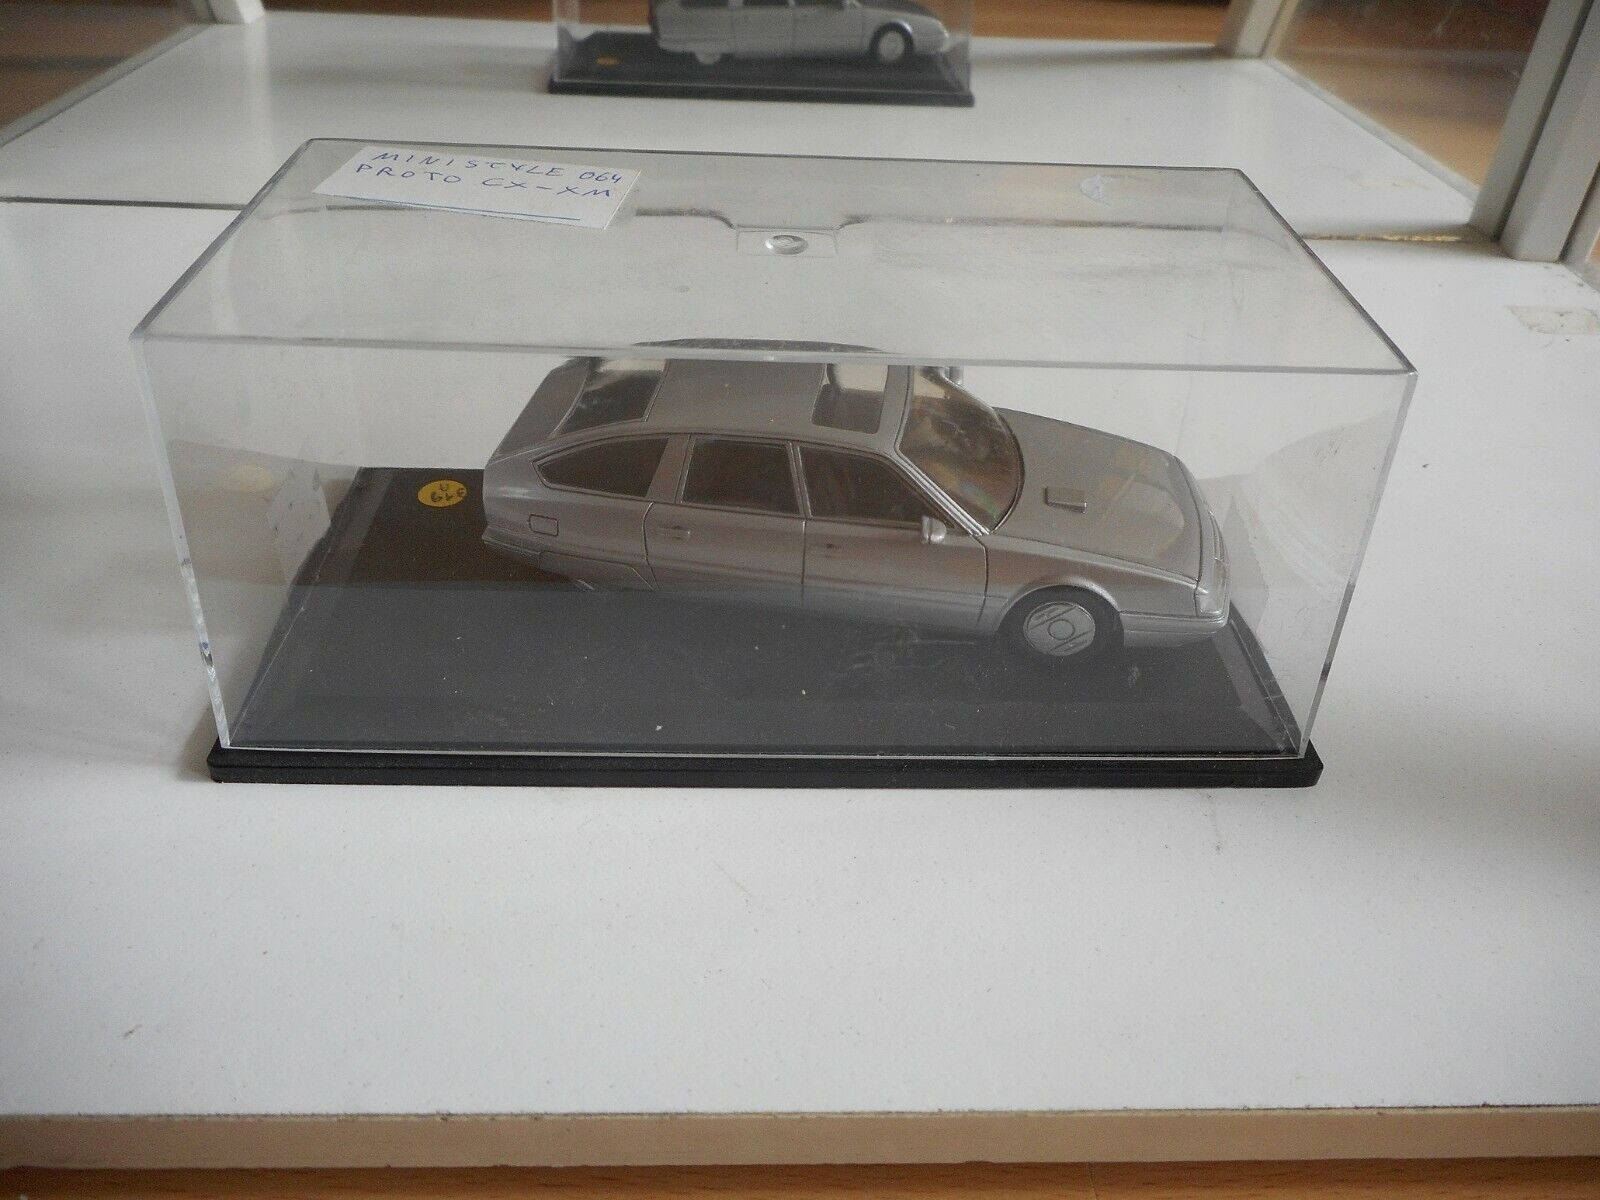 Ministyle Prototype Citroen CX - XM in grau on 1 43 in Box